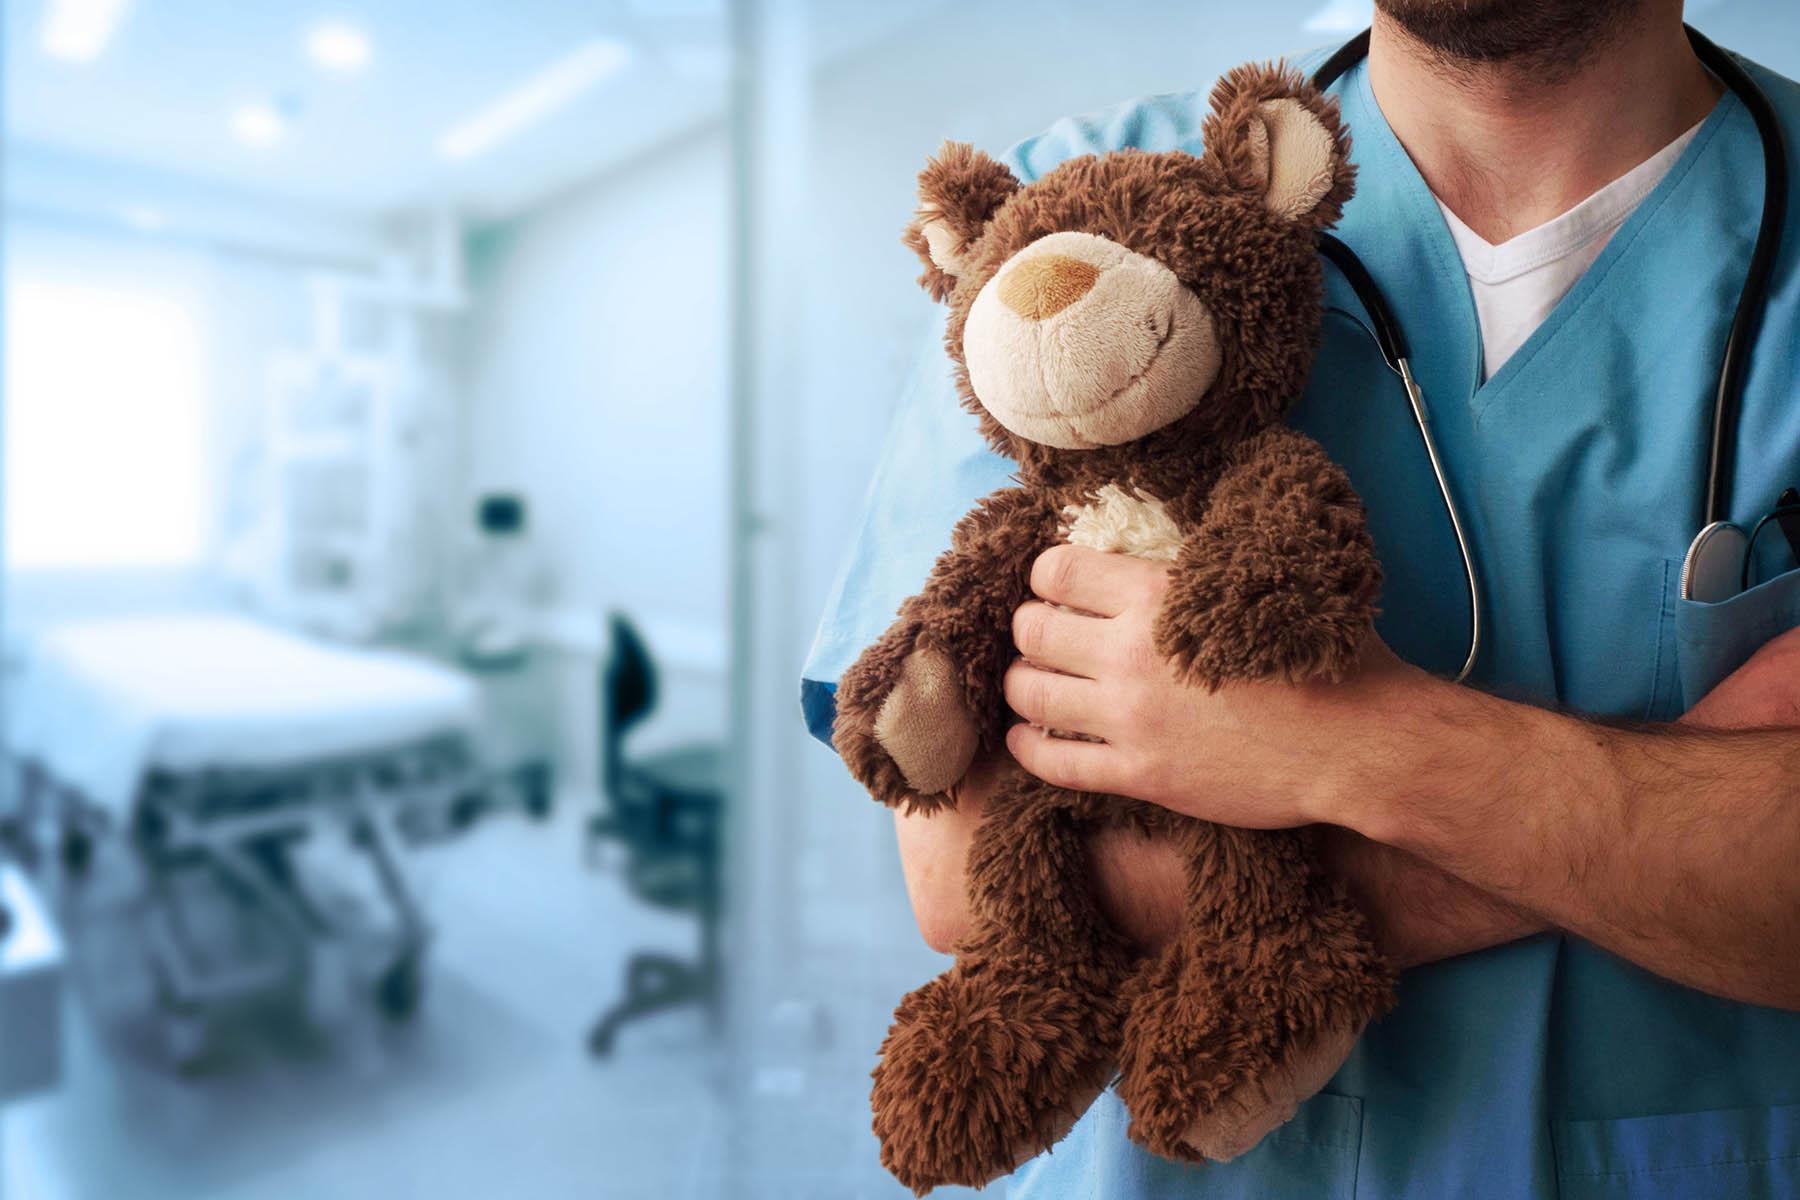 Doctor in hospital room holding teddy bear